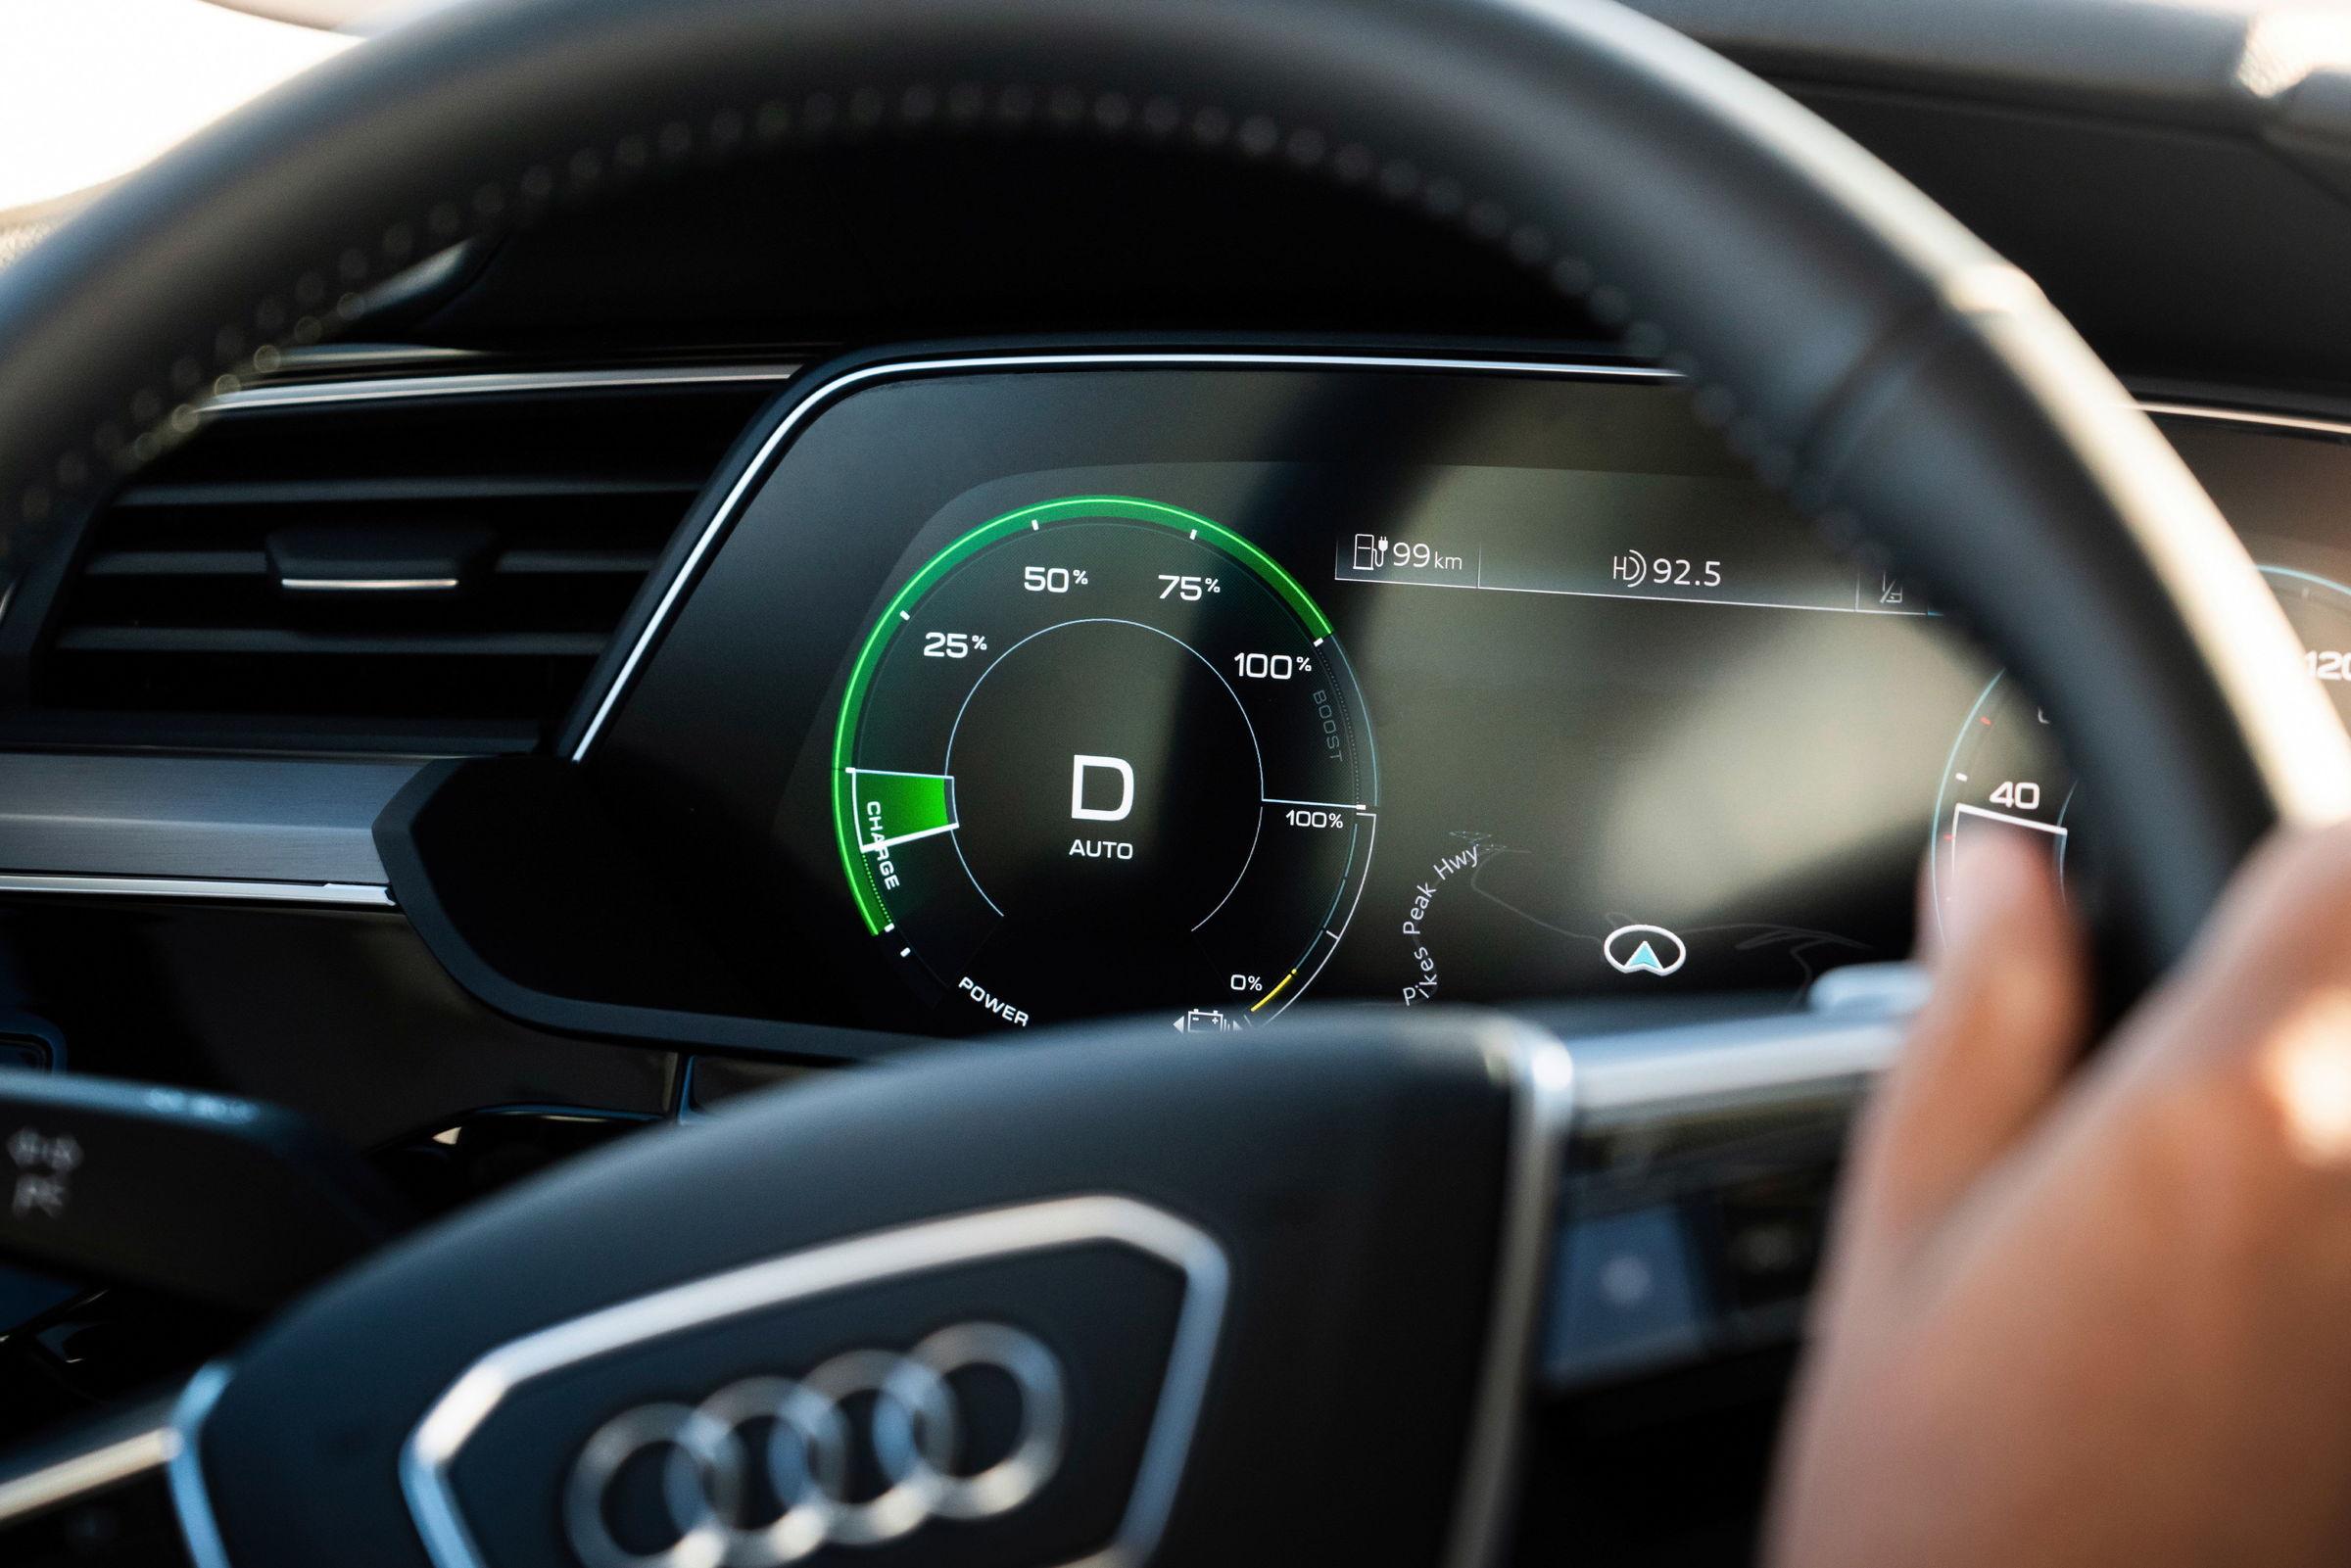 Drive system | Audi MediaCenter